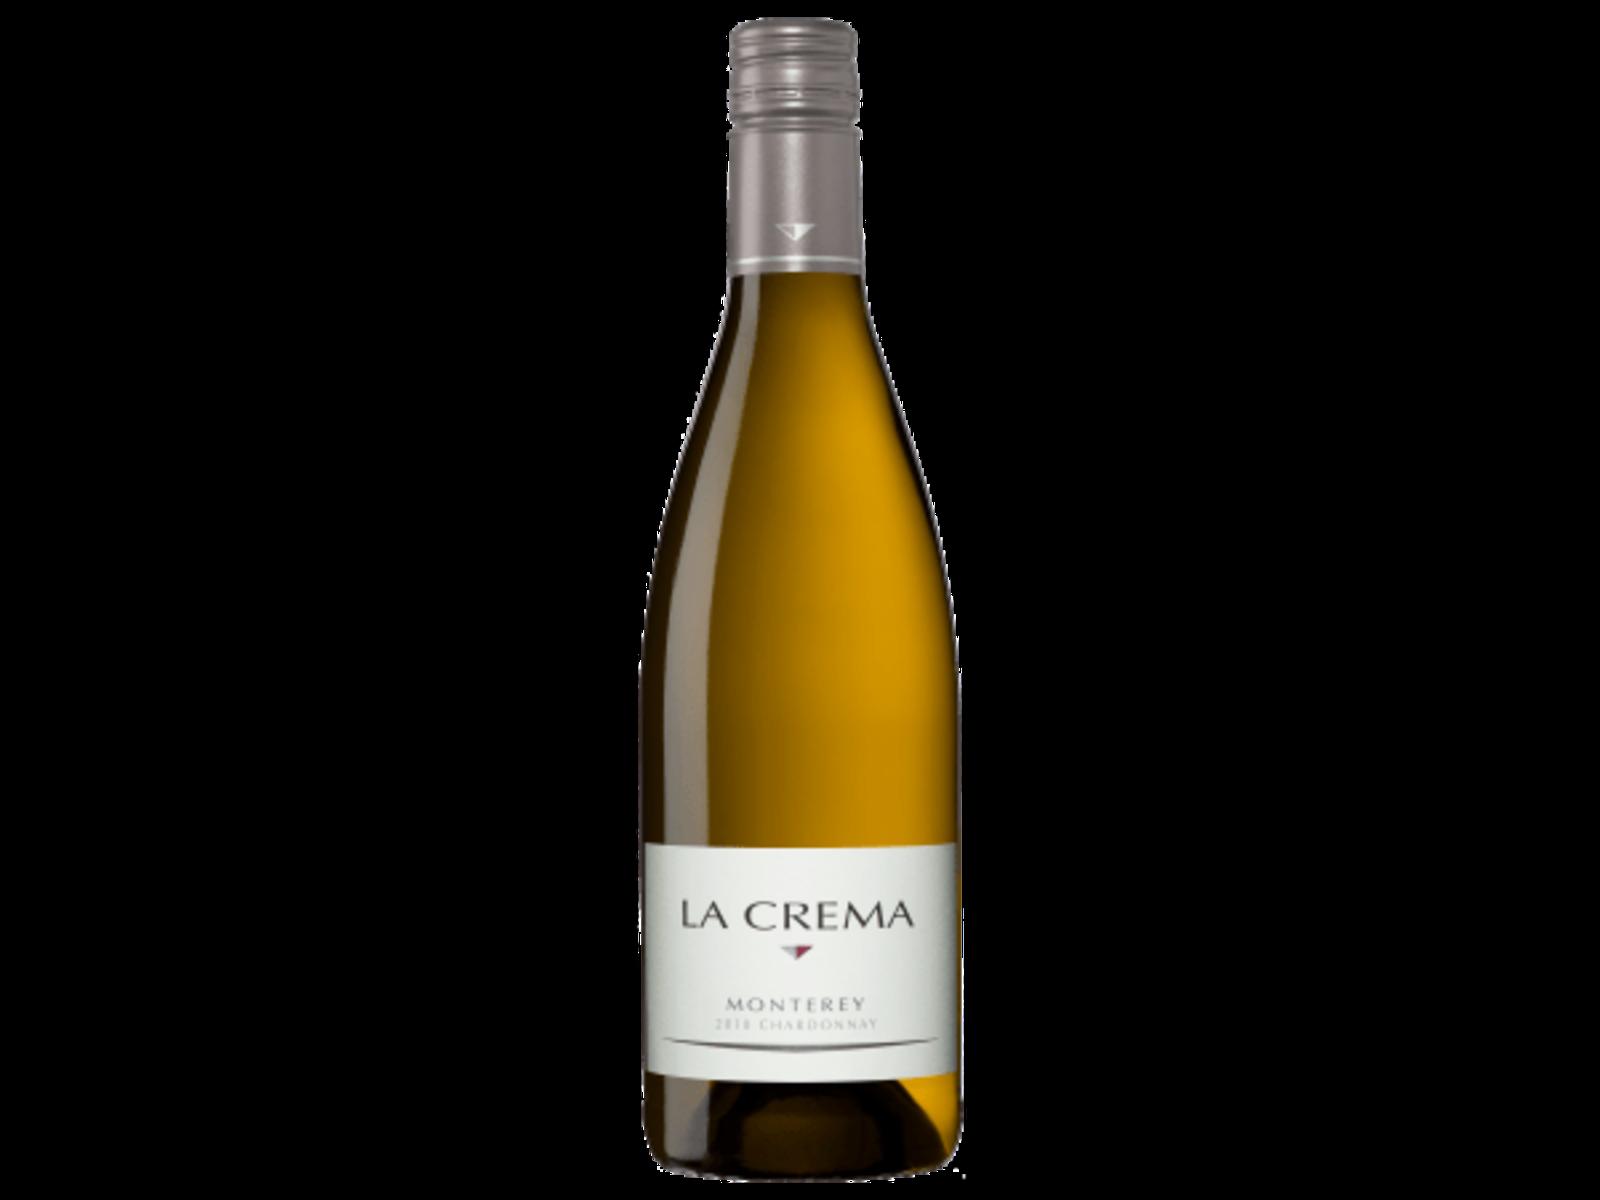 La Crema Winery La Crema / Monterey / Chardonnay